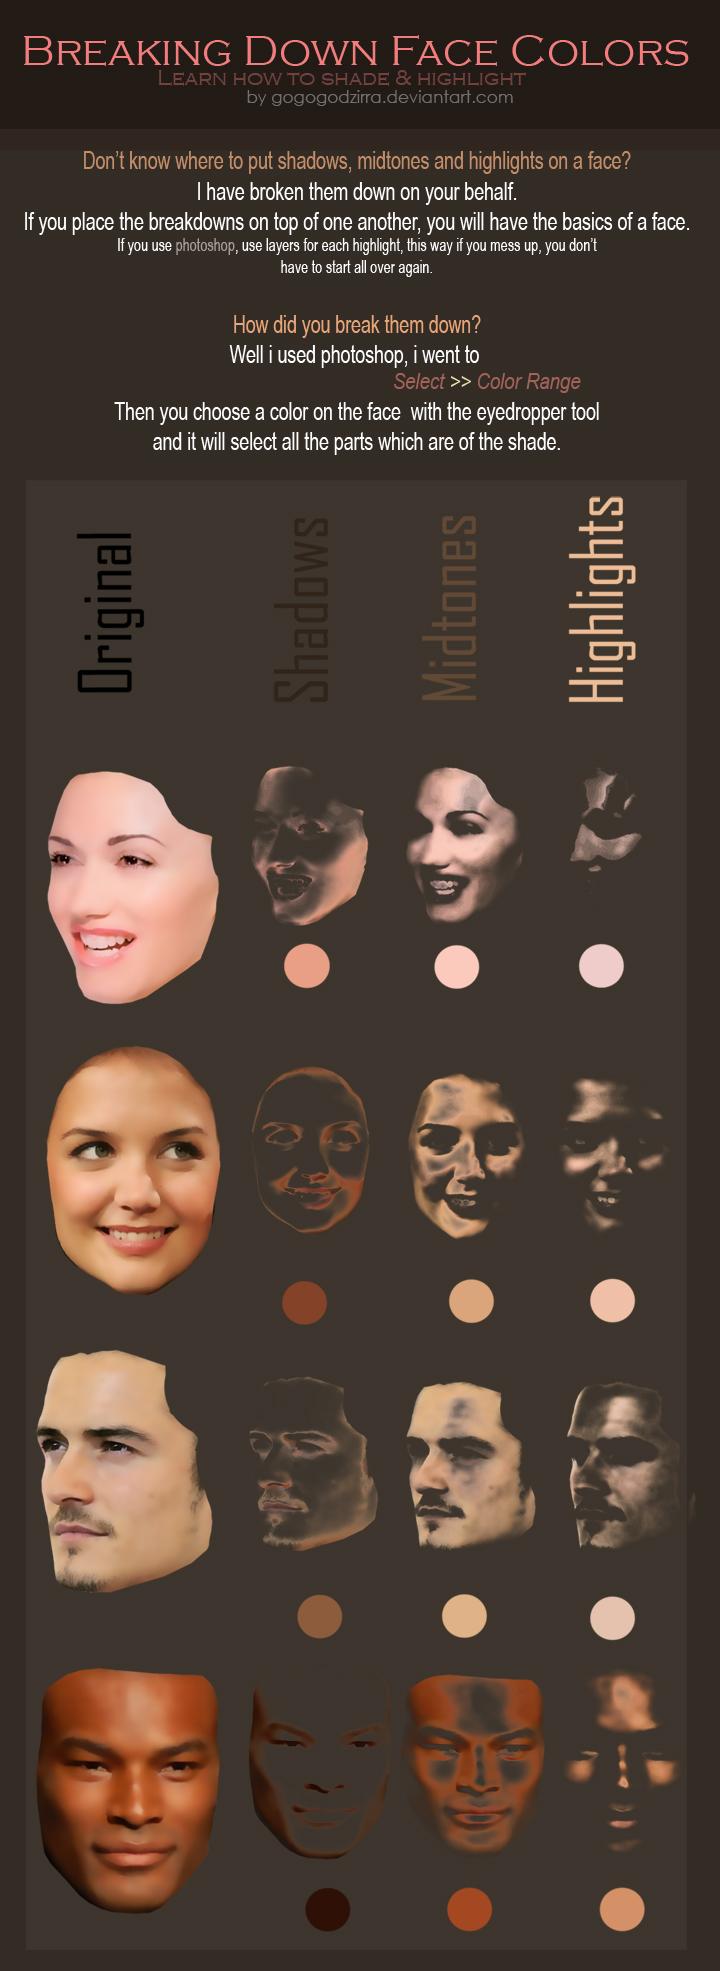 Highlights and Shadows of Face by GoGoGodzirra